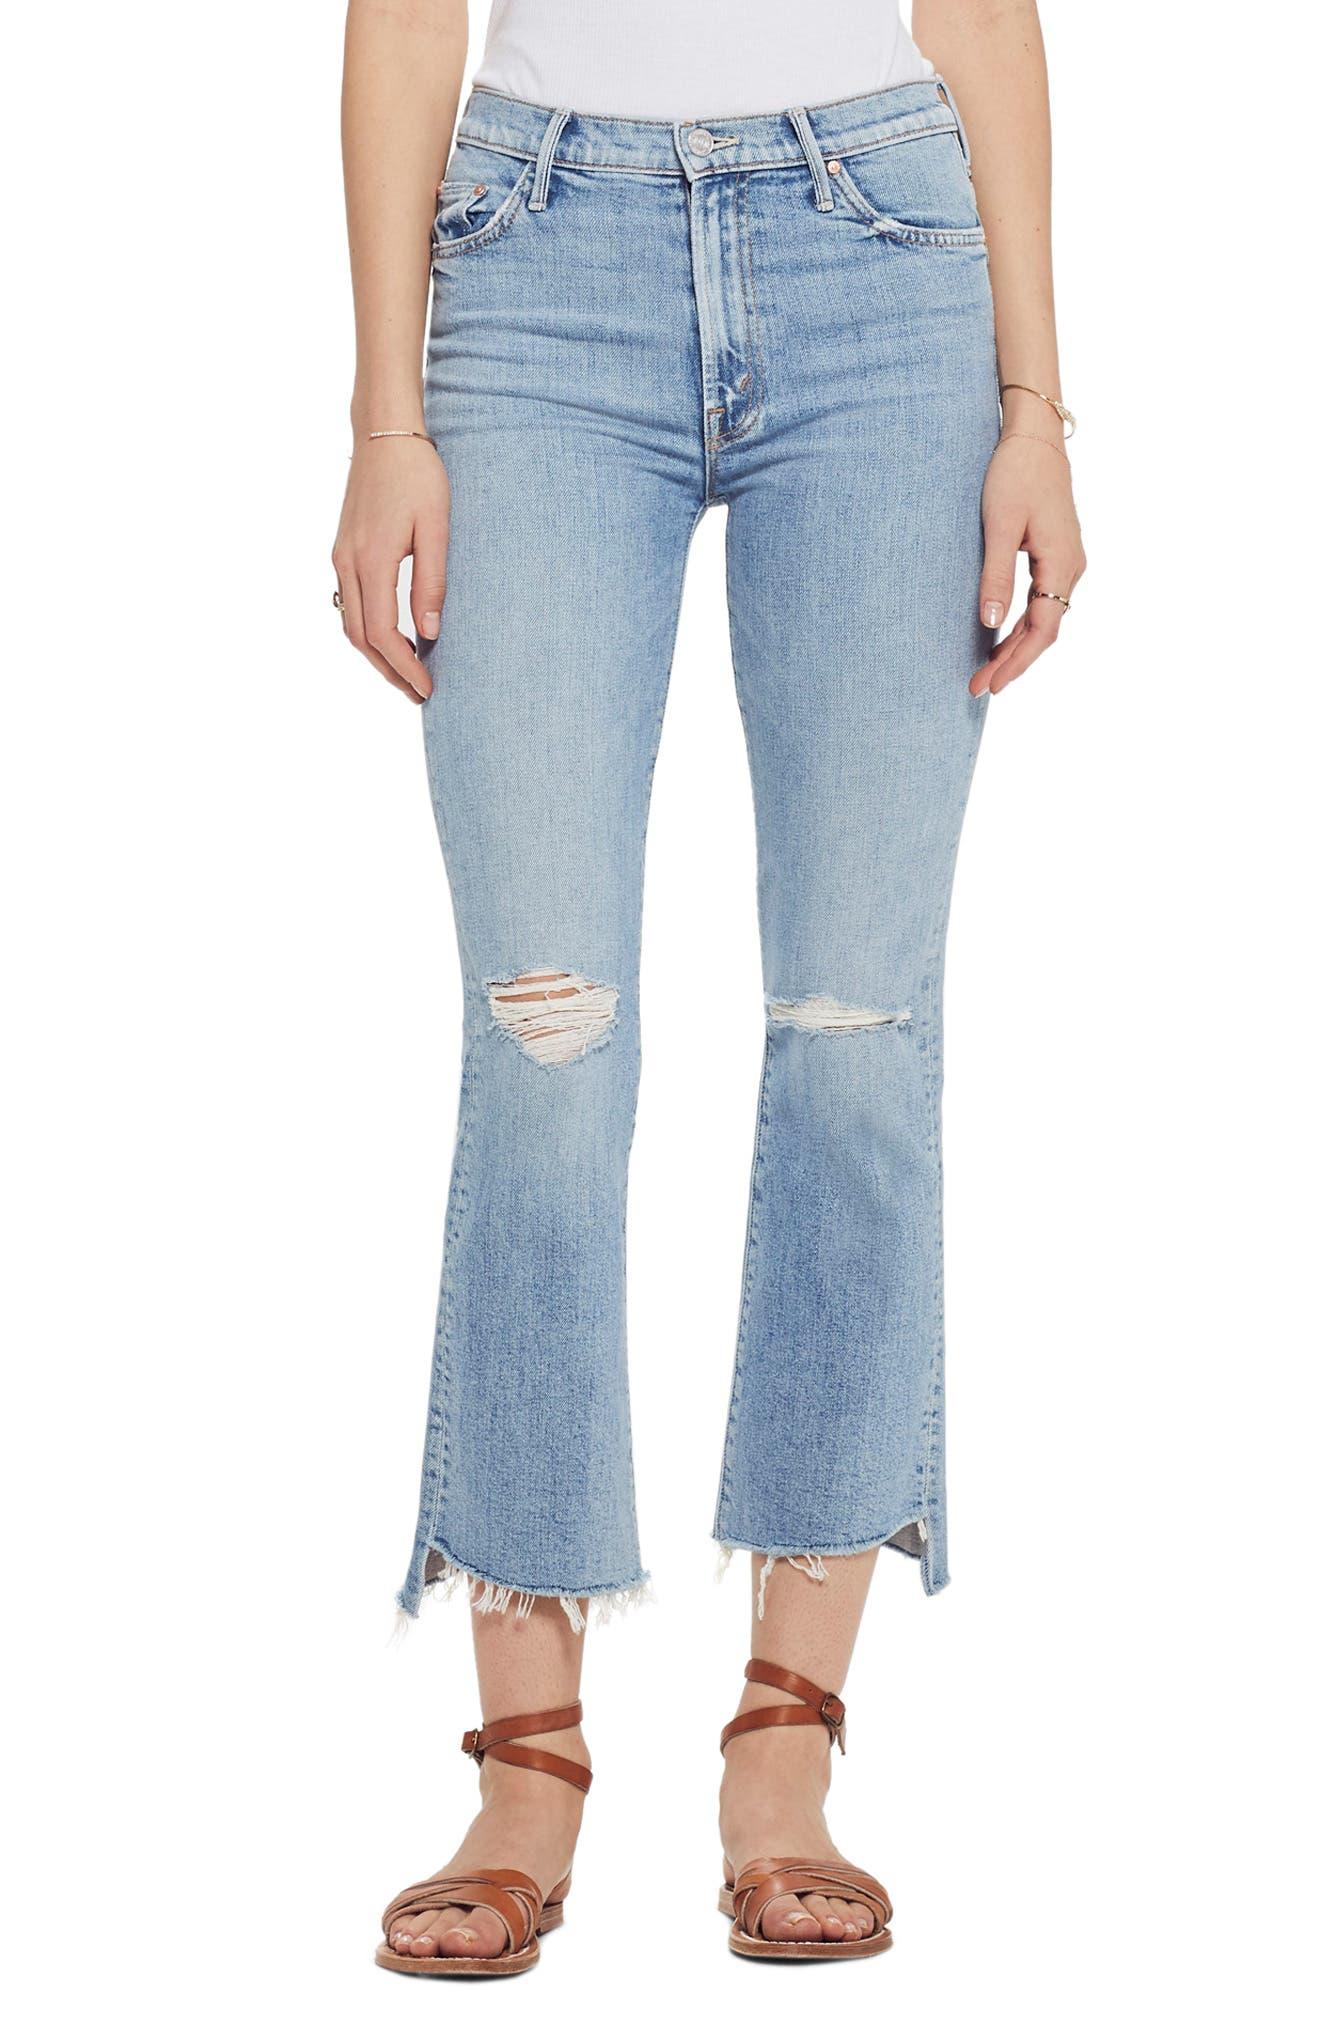 Image of MOTHER The Insider High Waist Crop Step Fray Hem Bootcut Jeans